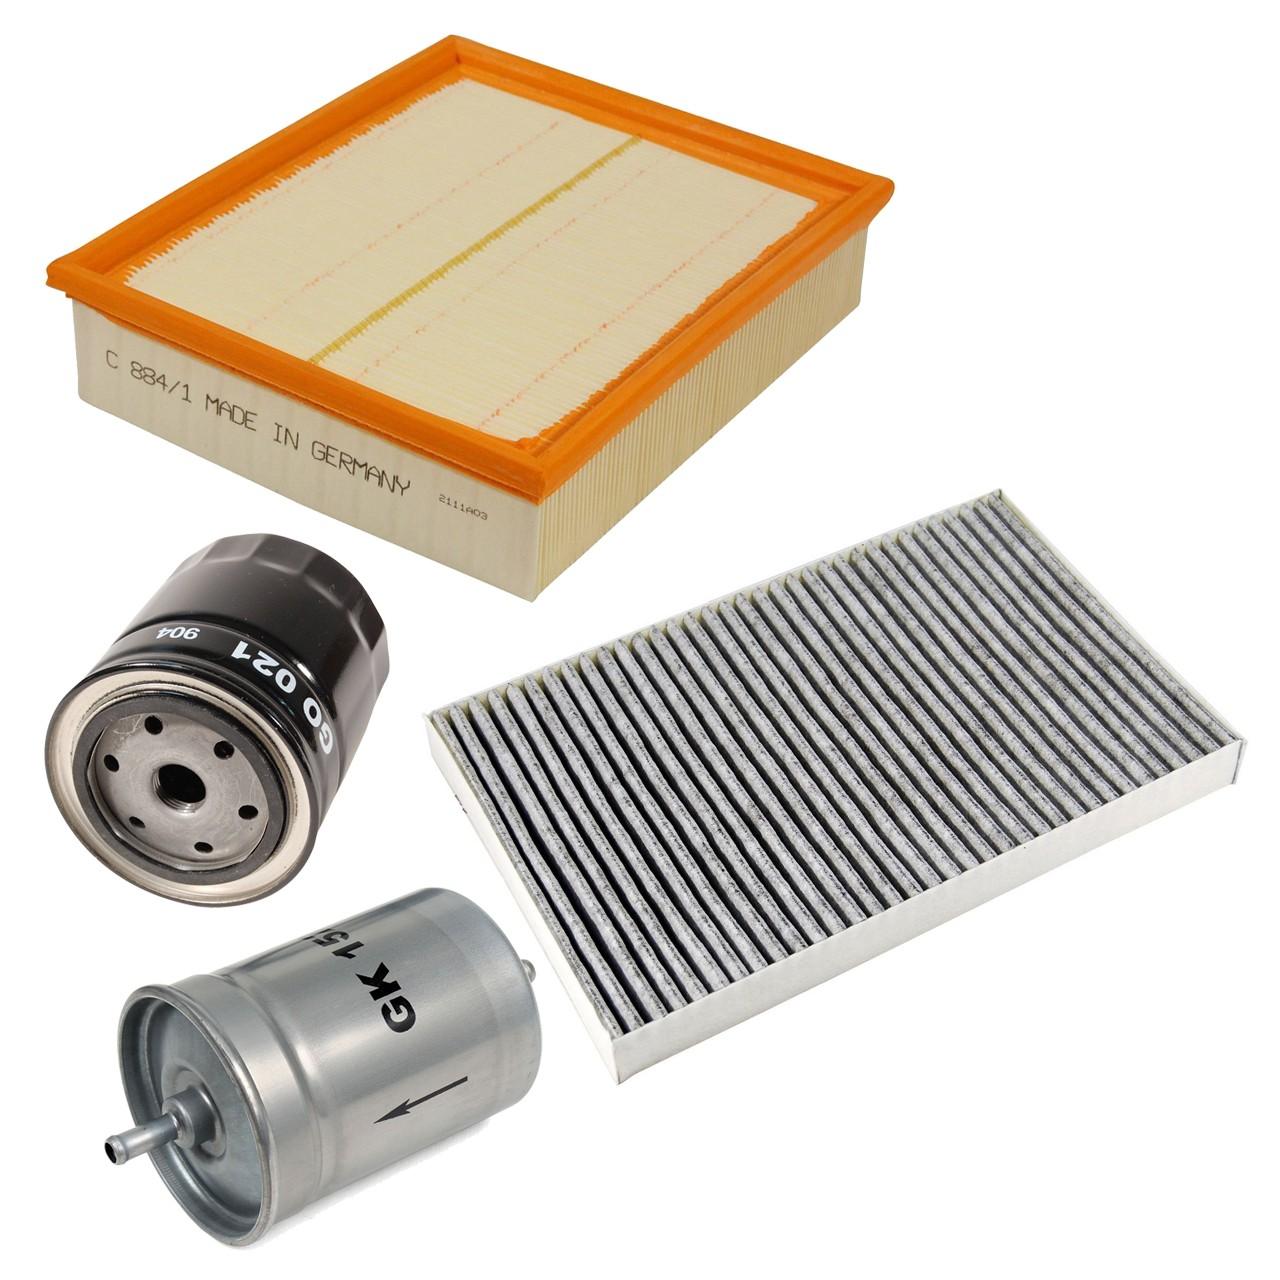 Inspektionskit Filterpaket Filterset für Audi A6 (4B C5) 2.4 2.7T 2.8 136-230 PS